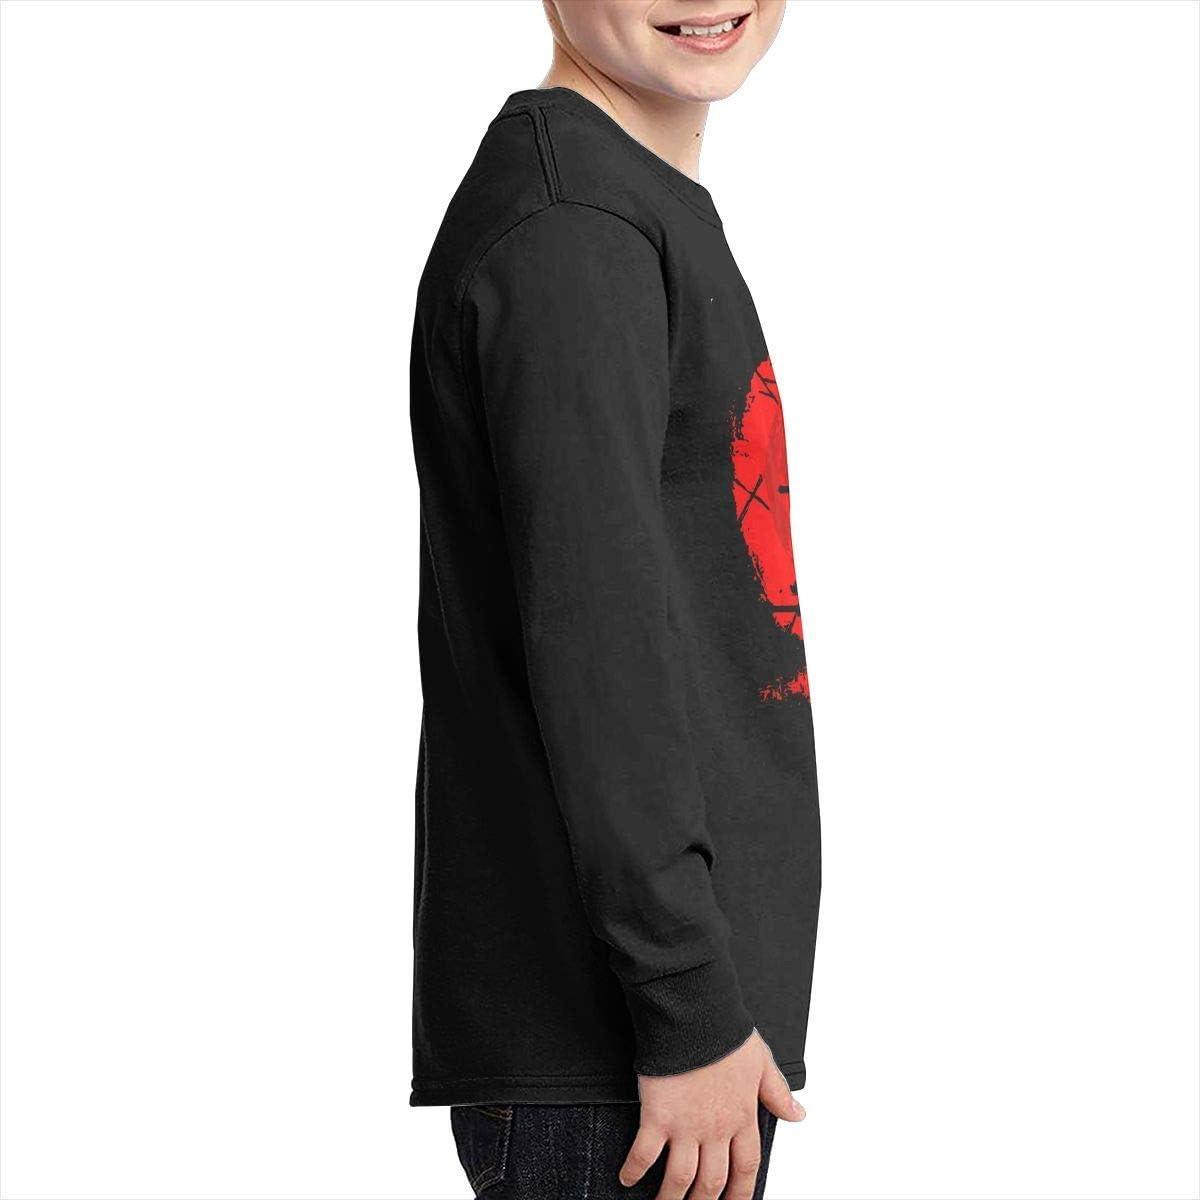 Kilsd Boys /& Girls Junior Cool God of War 4 Long Sleeve Tshirts Black